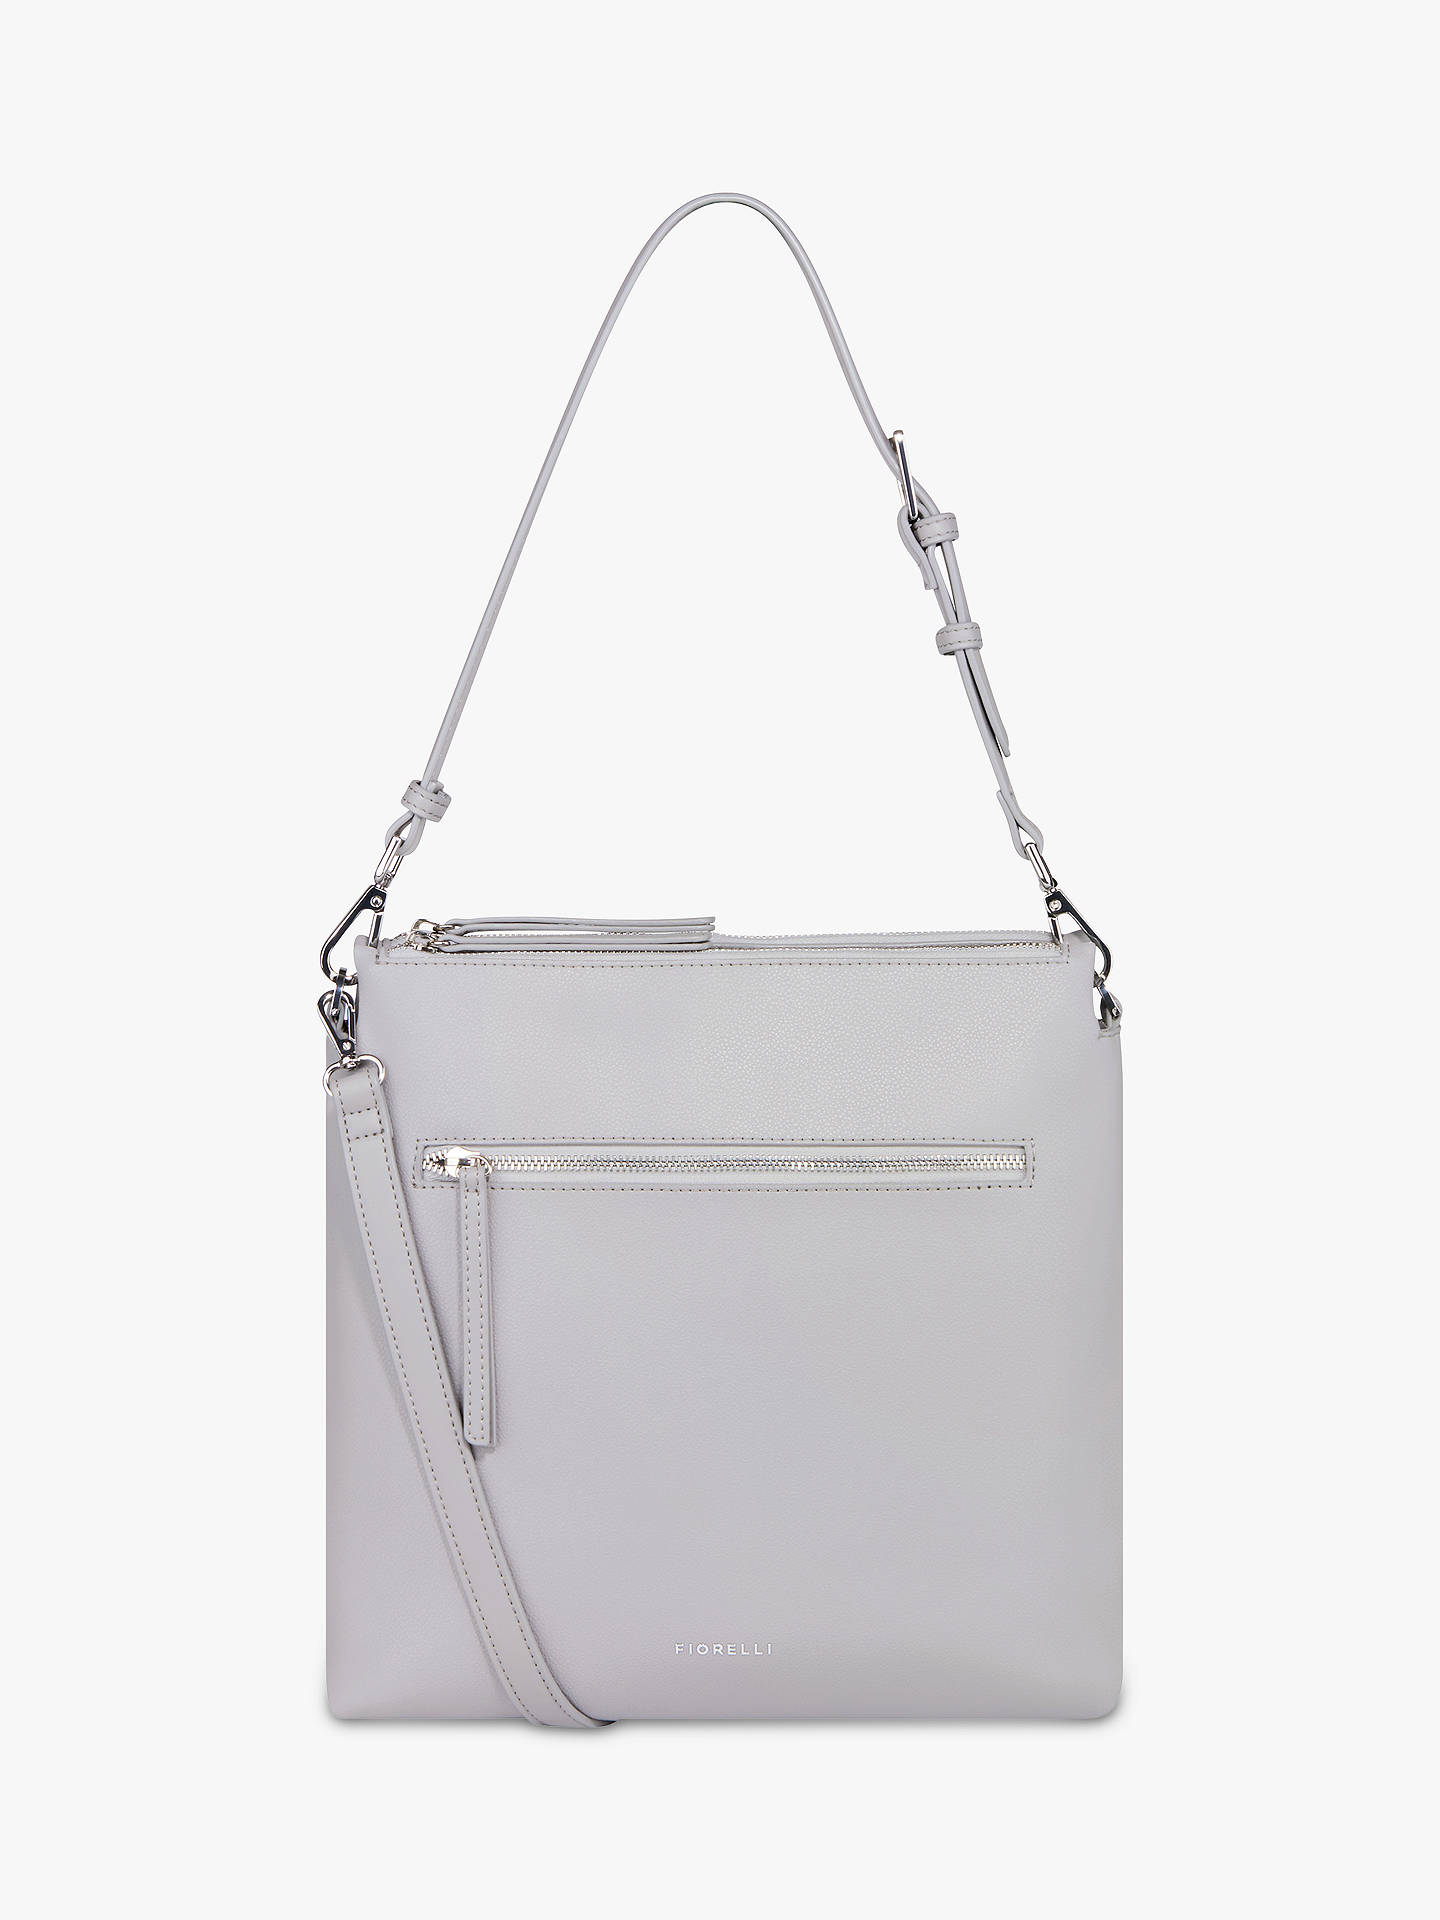 8ba2d638b51 Buy Fiorelli Elliot Cross Body Satchel Bag, Steel Online at johnlewis.com  ...